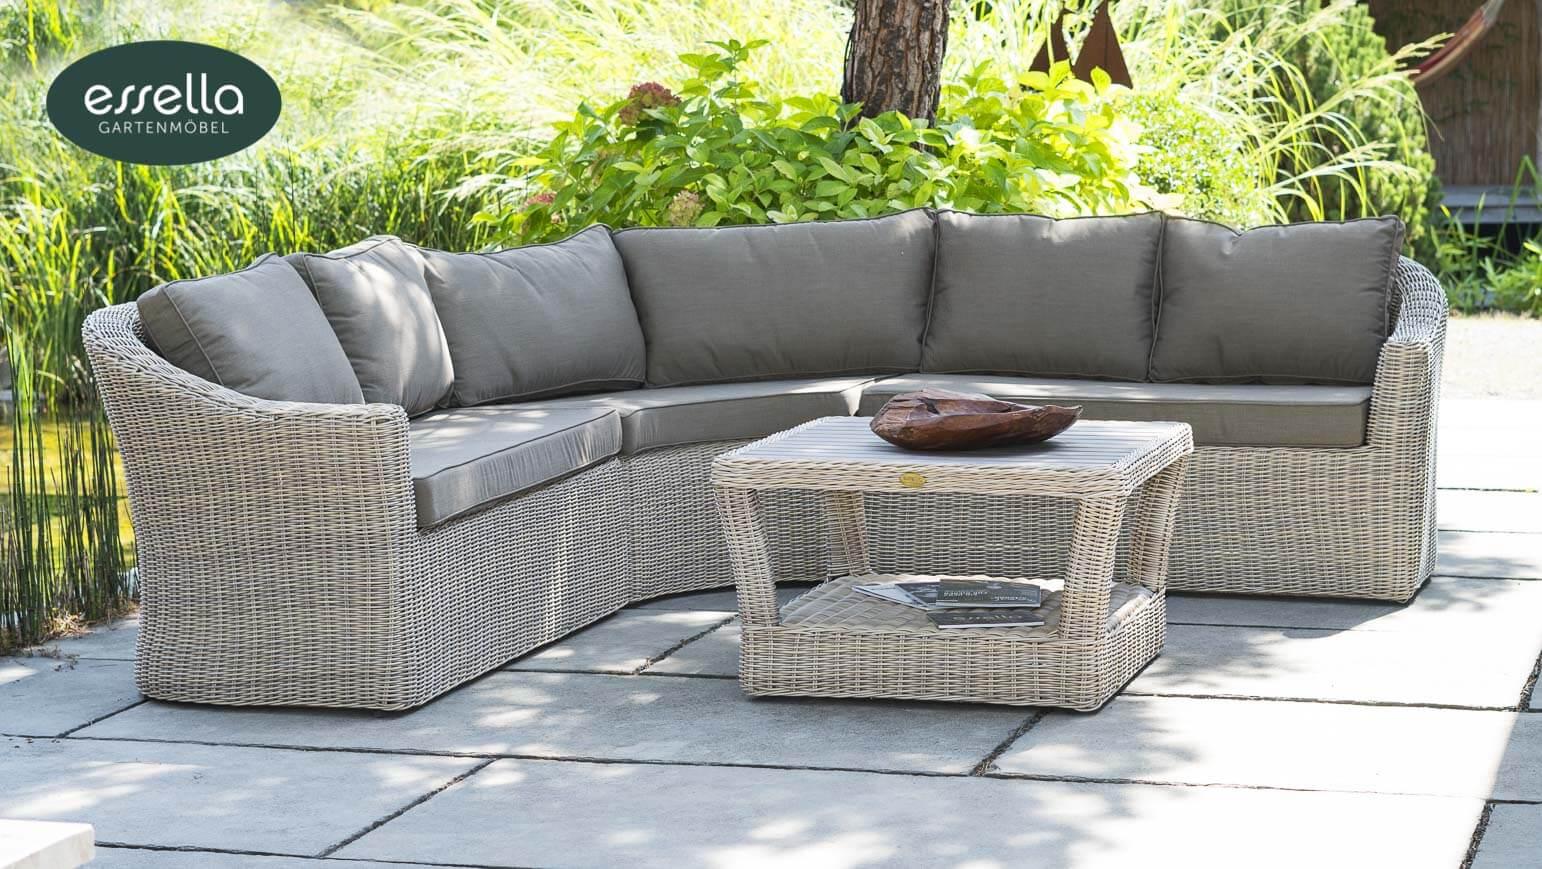 vorschau essella polyrattan lounge porto sand rundgeflecht. Black Bedroom Furniture Sets. Home Design Ideas